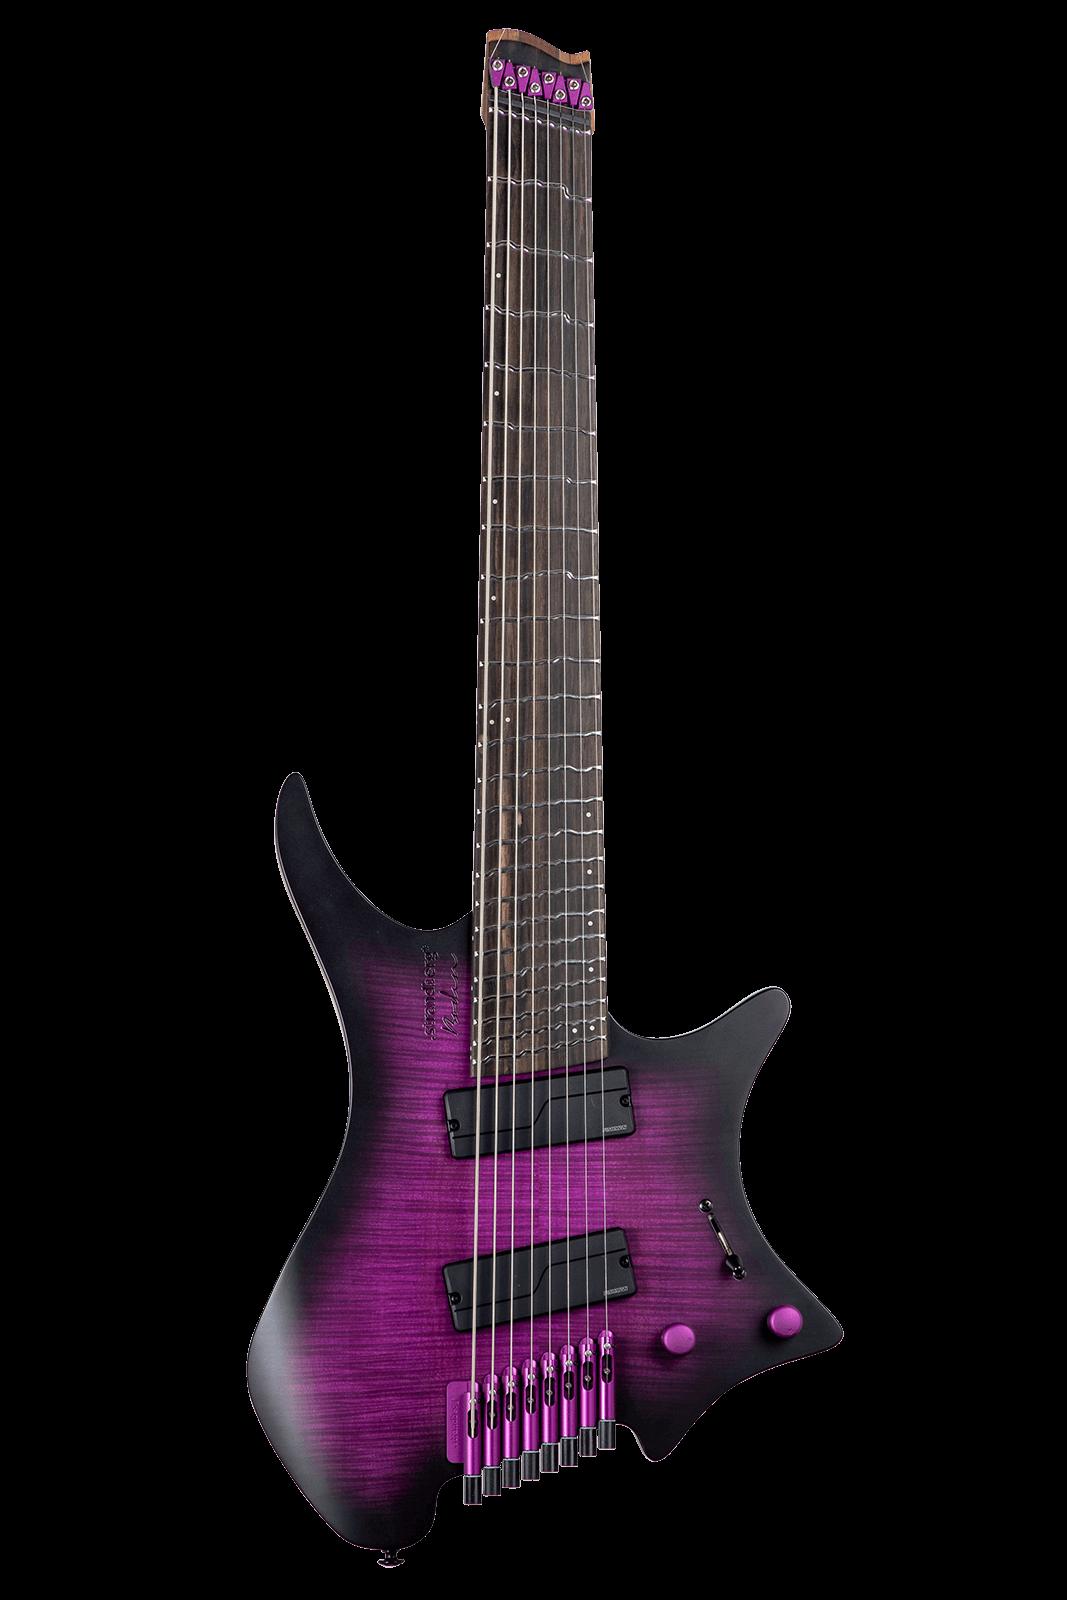 True Temperament purple headless guitar 8 string front view fretboard